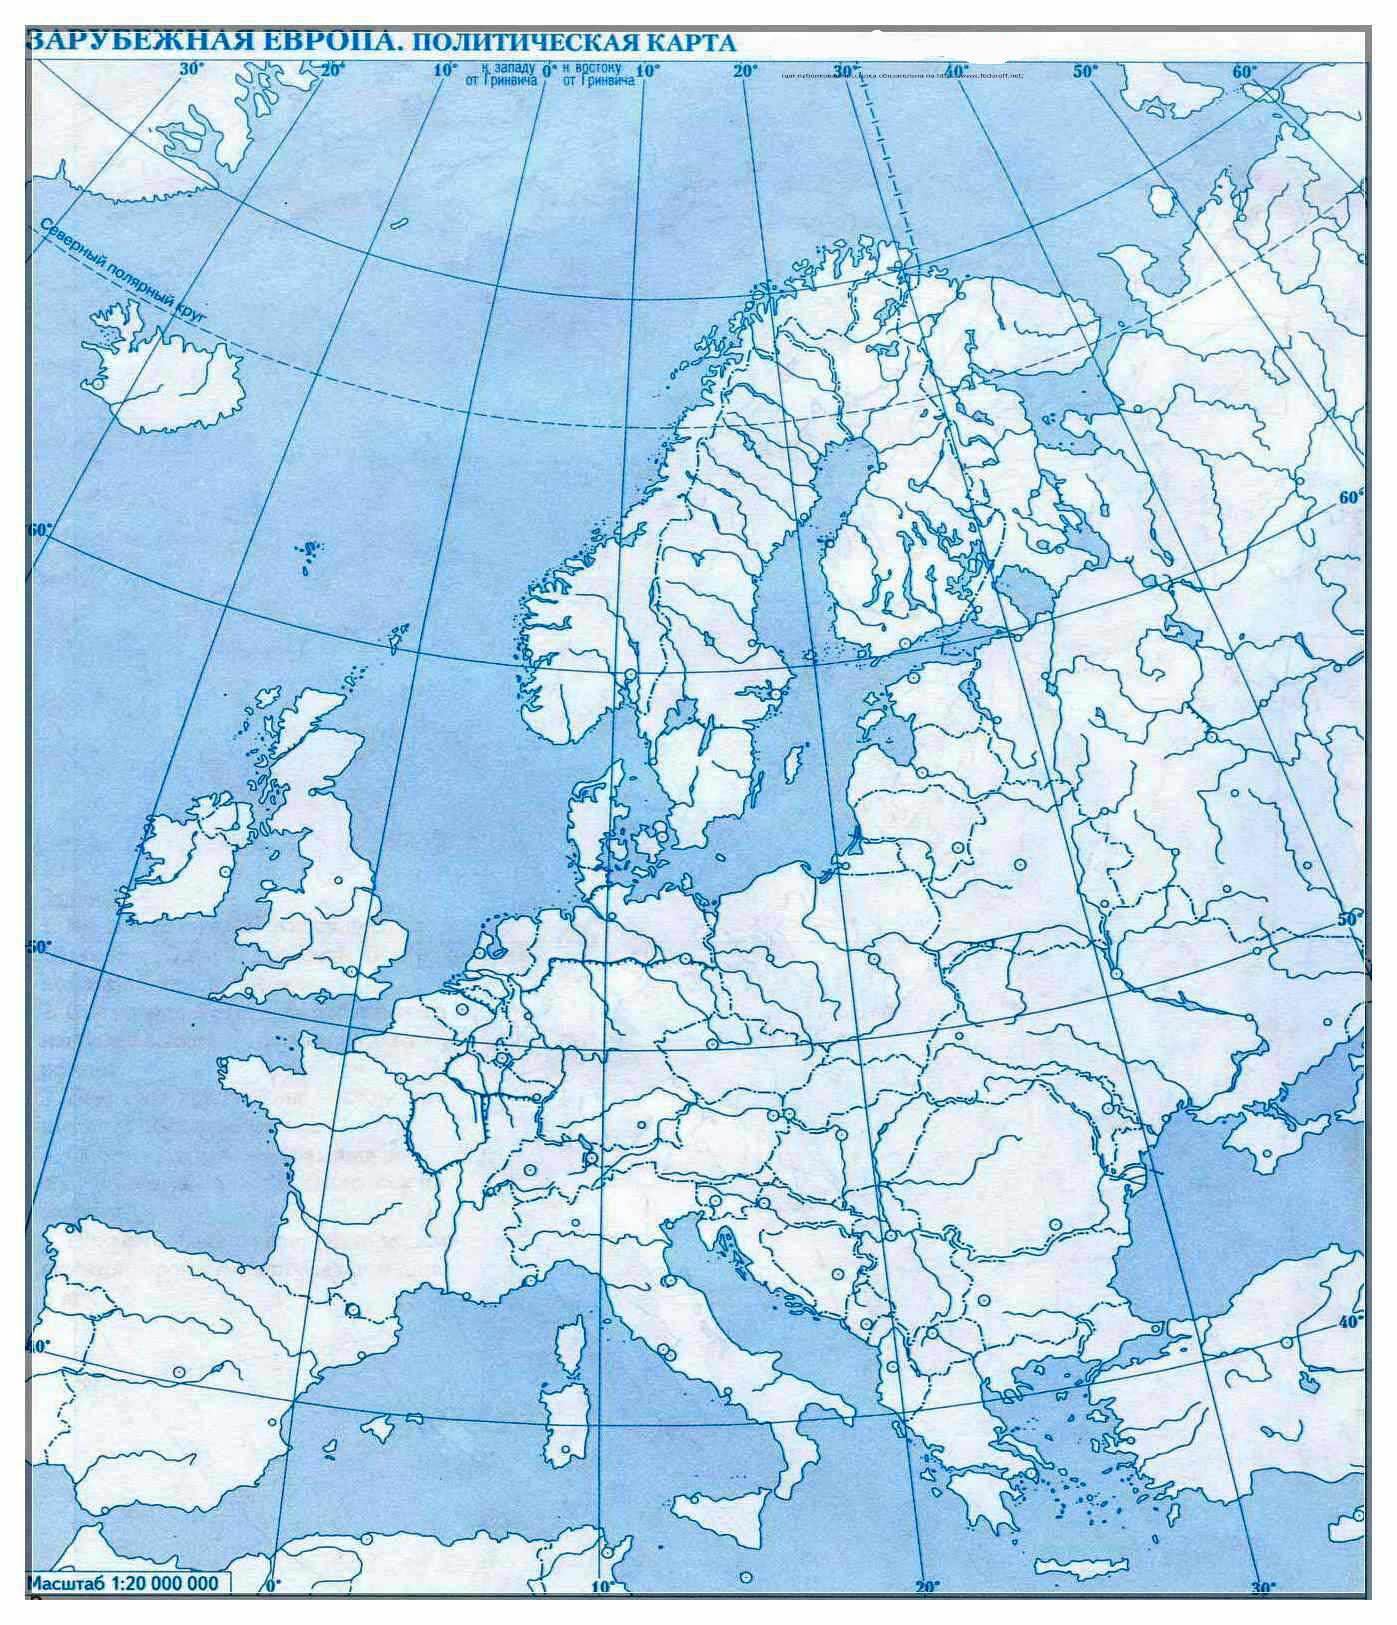 Konturnaya Karta Evropy